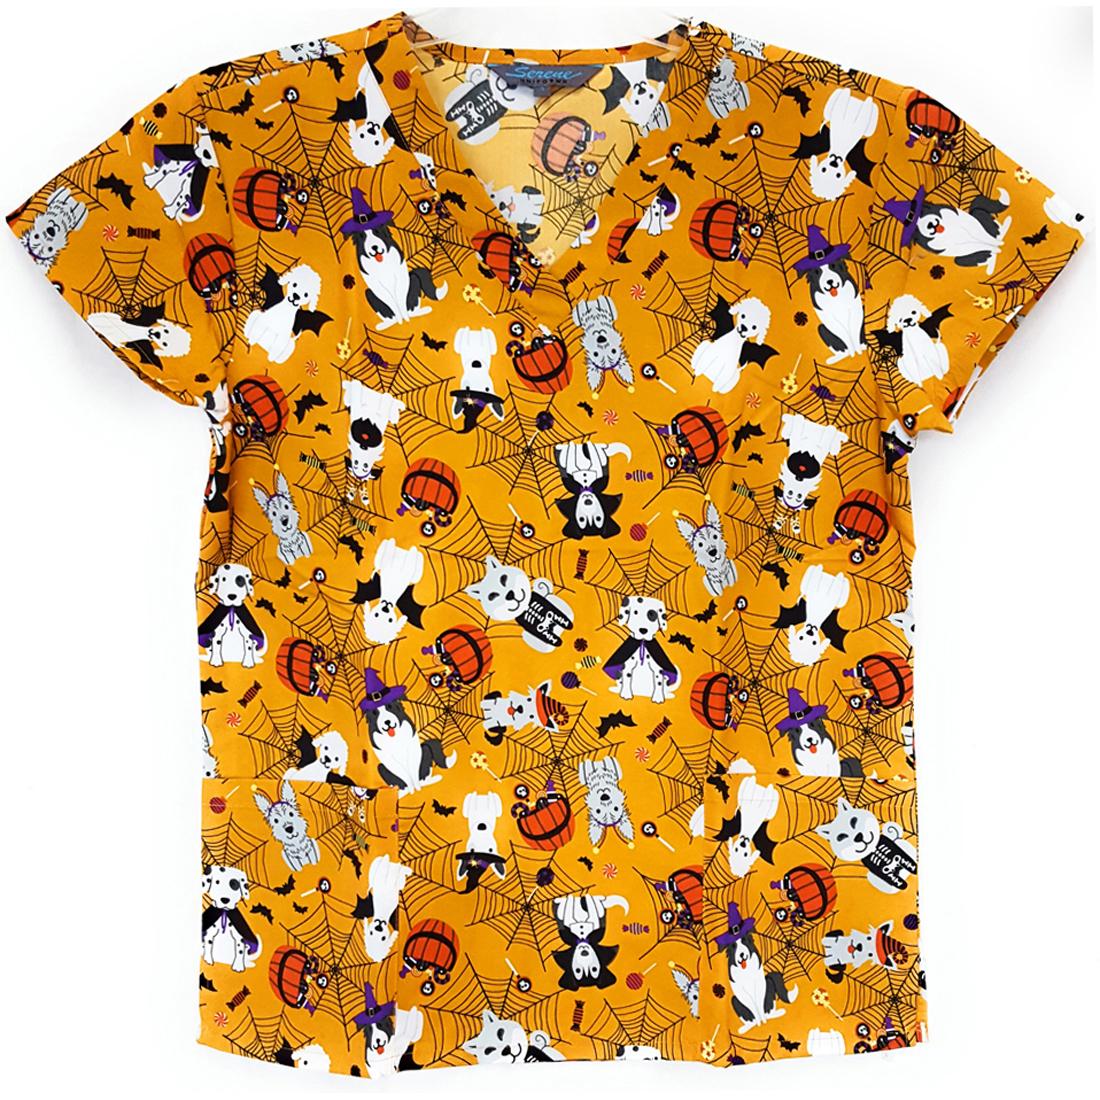 V-Neck-Halloween-Print-Scrub-Top-Microfiber-Medical-Uniform-Shirt-DSF-Uniforms miniature 16